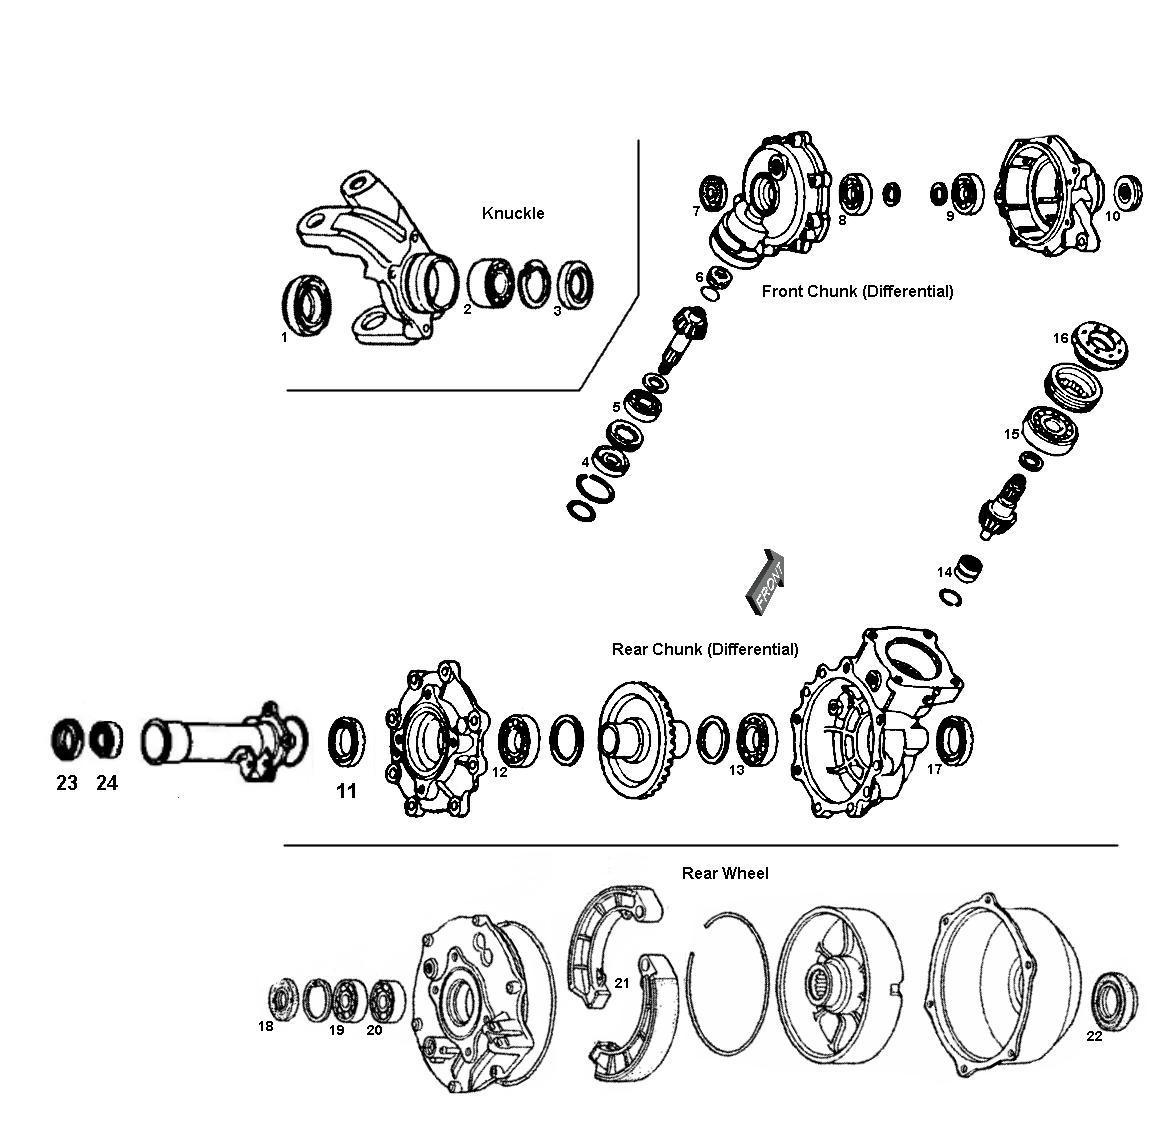 hight resolution of 03 honda 35 rancher wiring diagram honda odyssey wiring